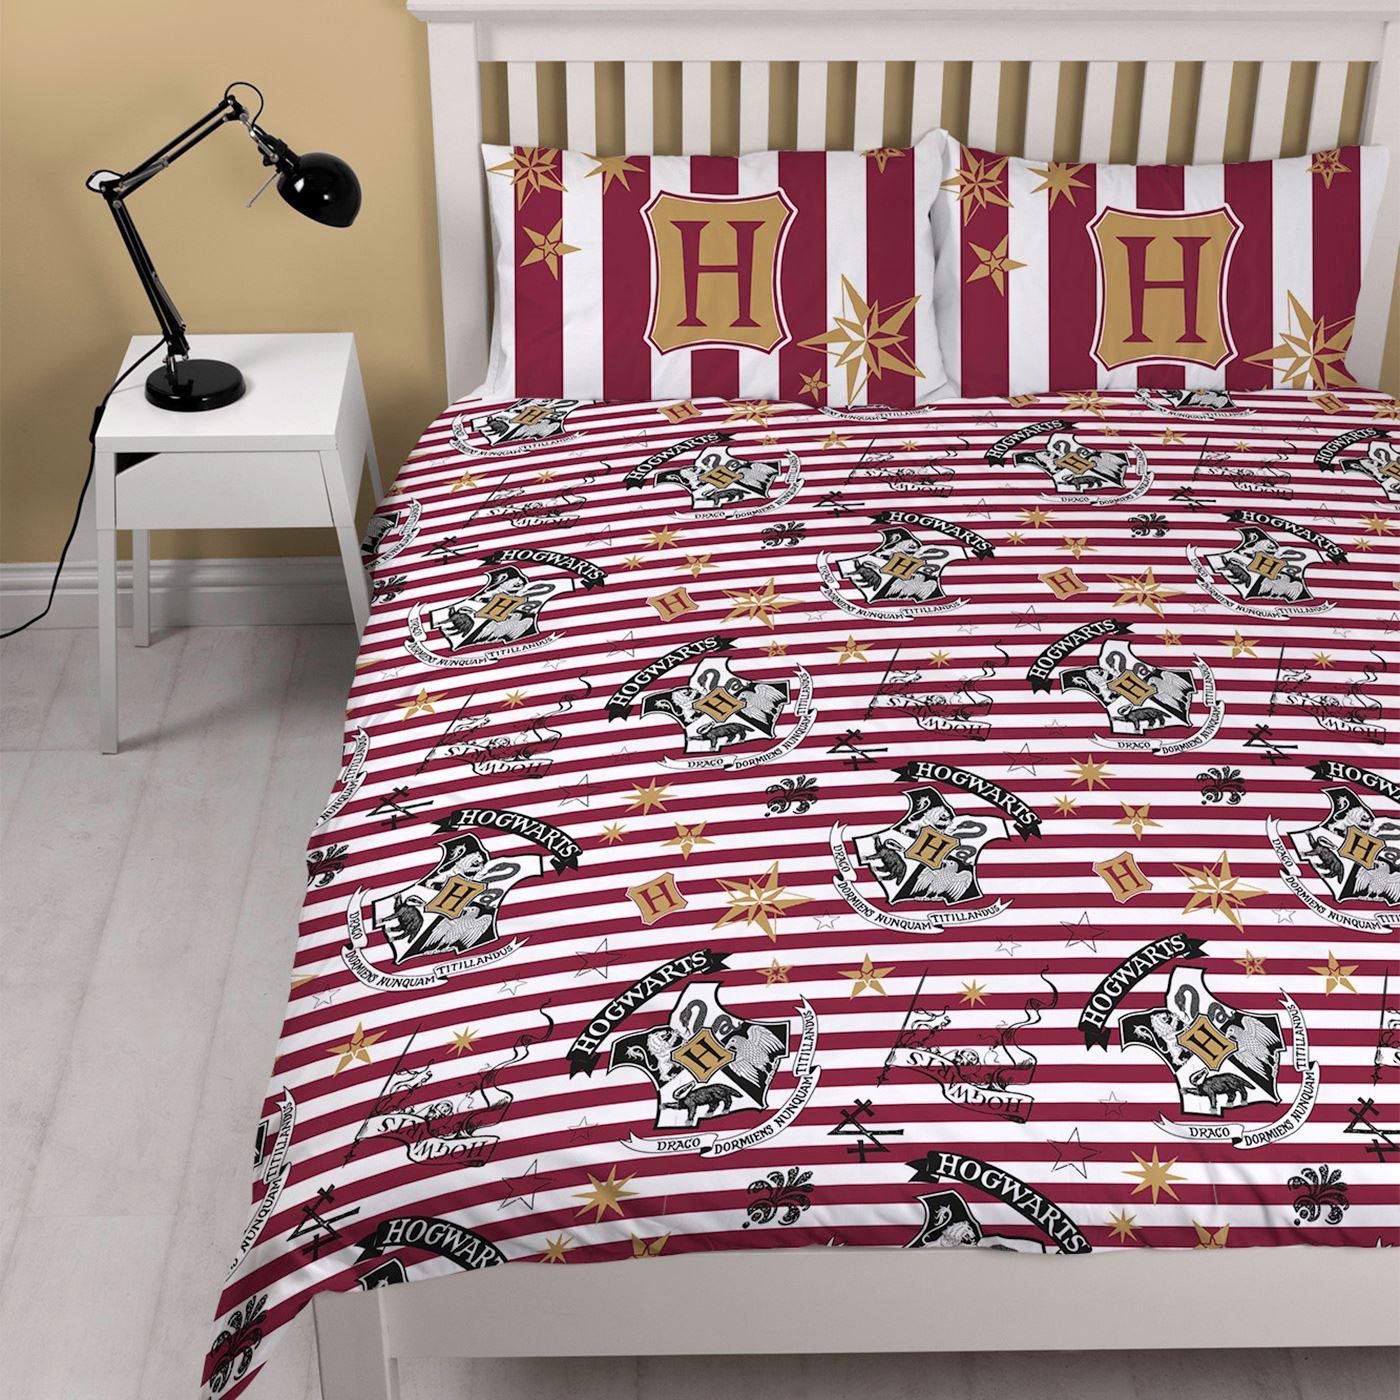 harry potter doppelbett bezug set bettw sche kinder 2 designs in 1 ebay. Black Bedroom Furniture Sets. Home Design Ideas